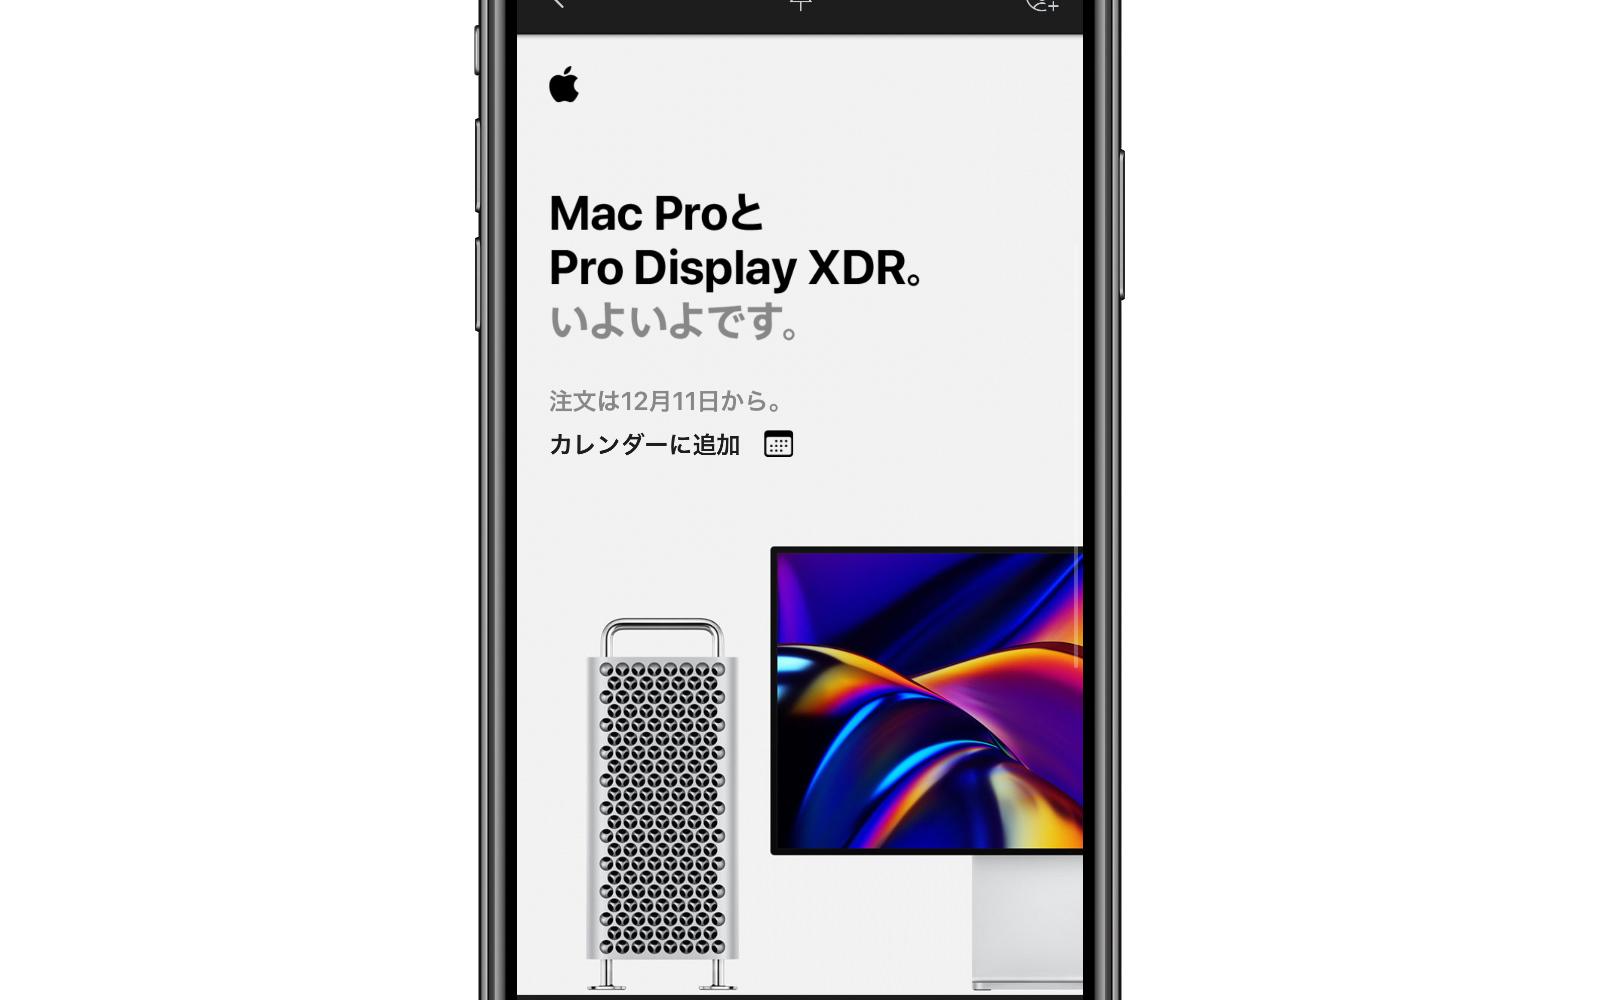 Mac-Pro-ProDisplayXDR-on-sale.jpg